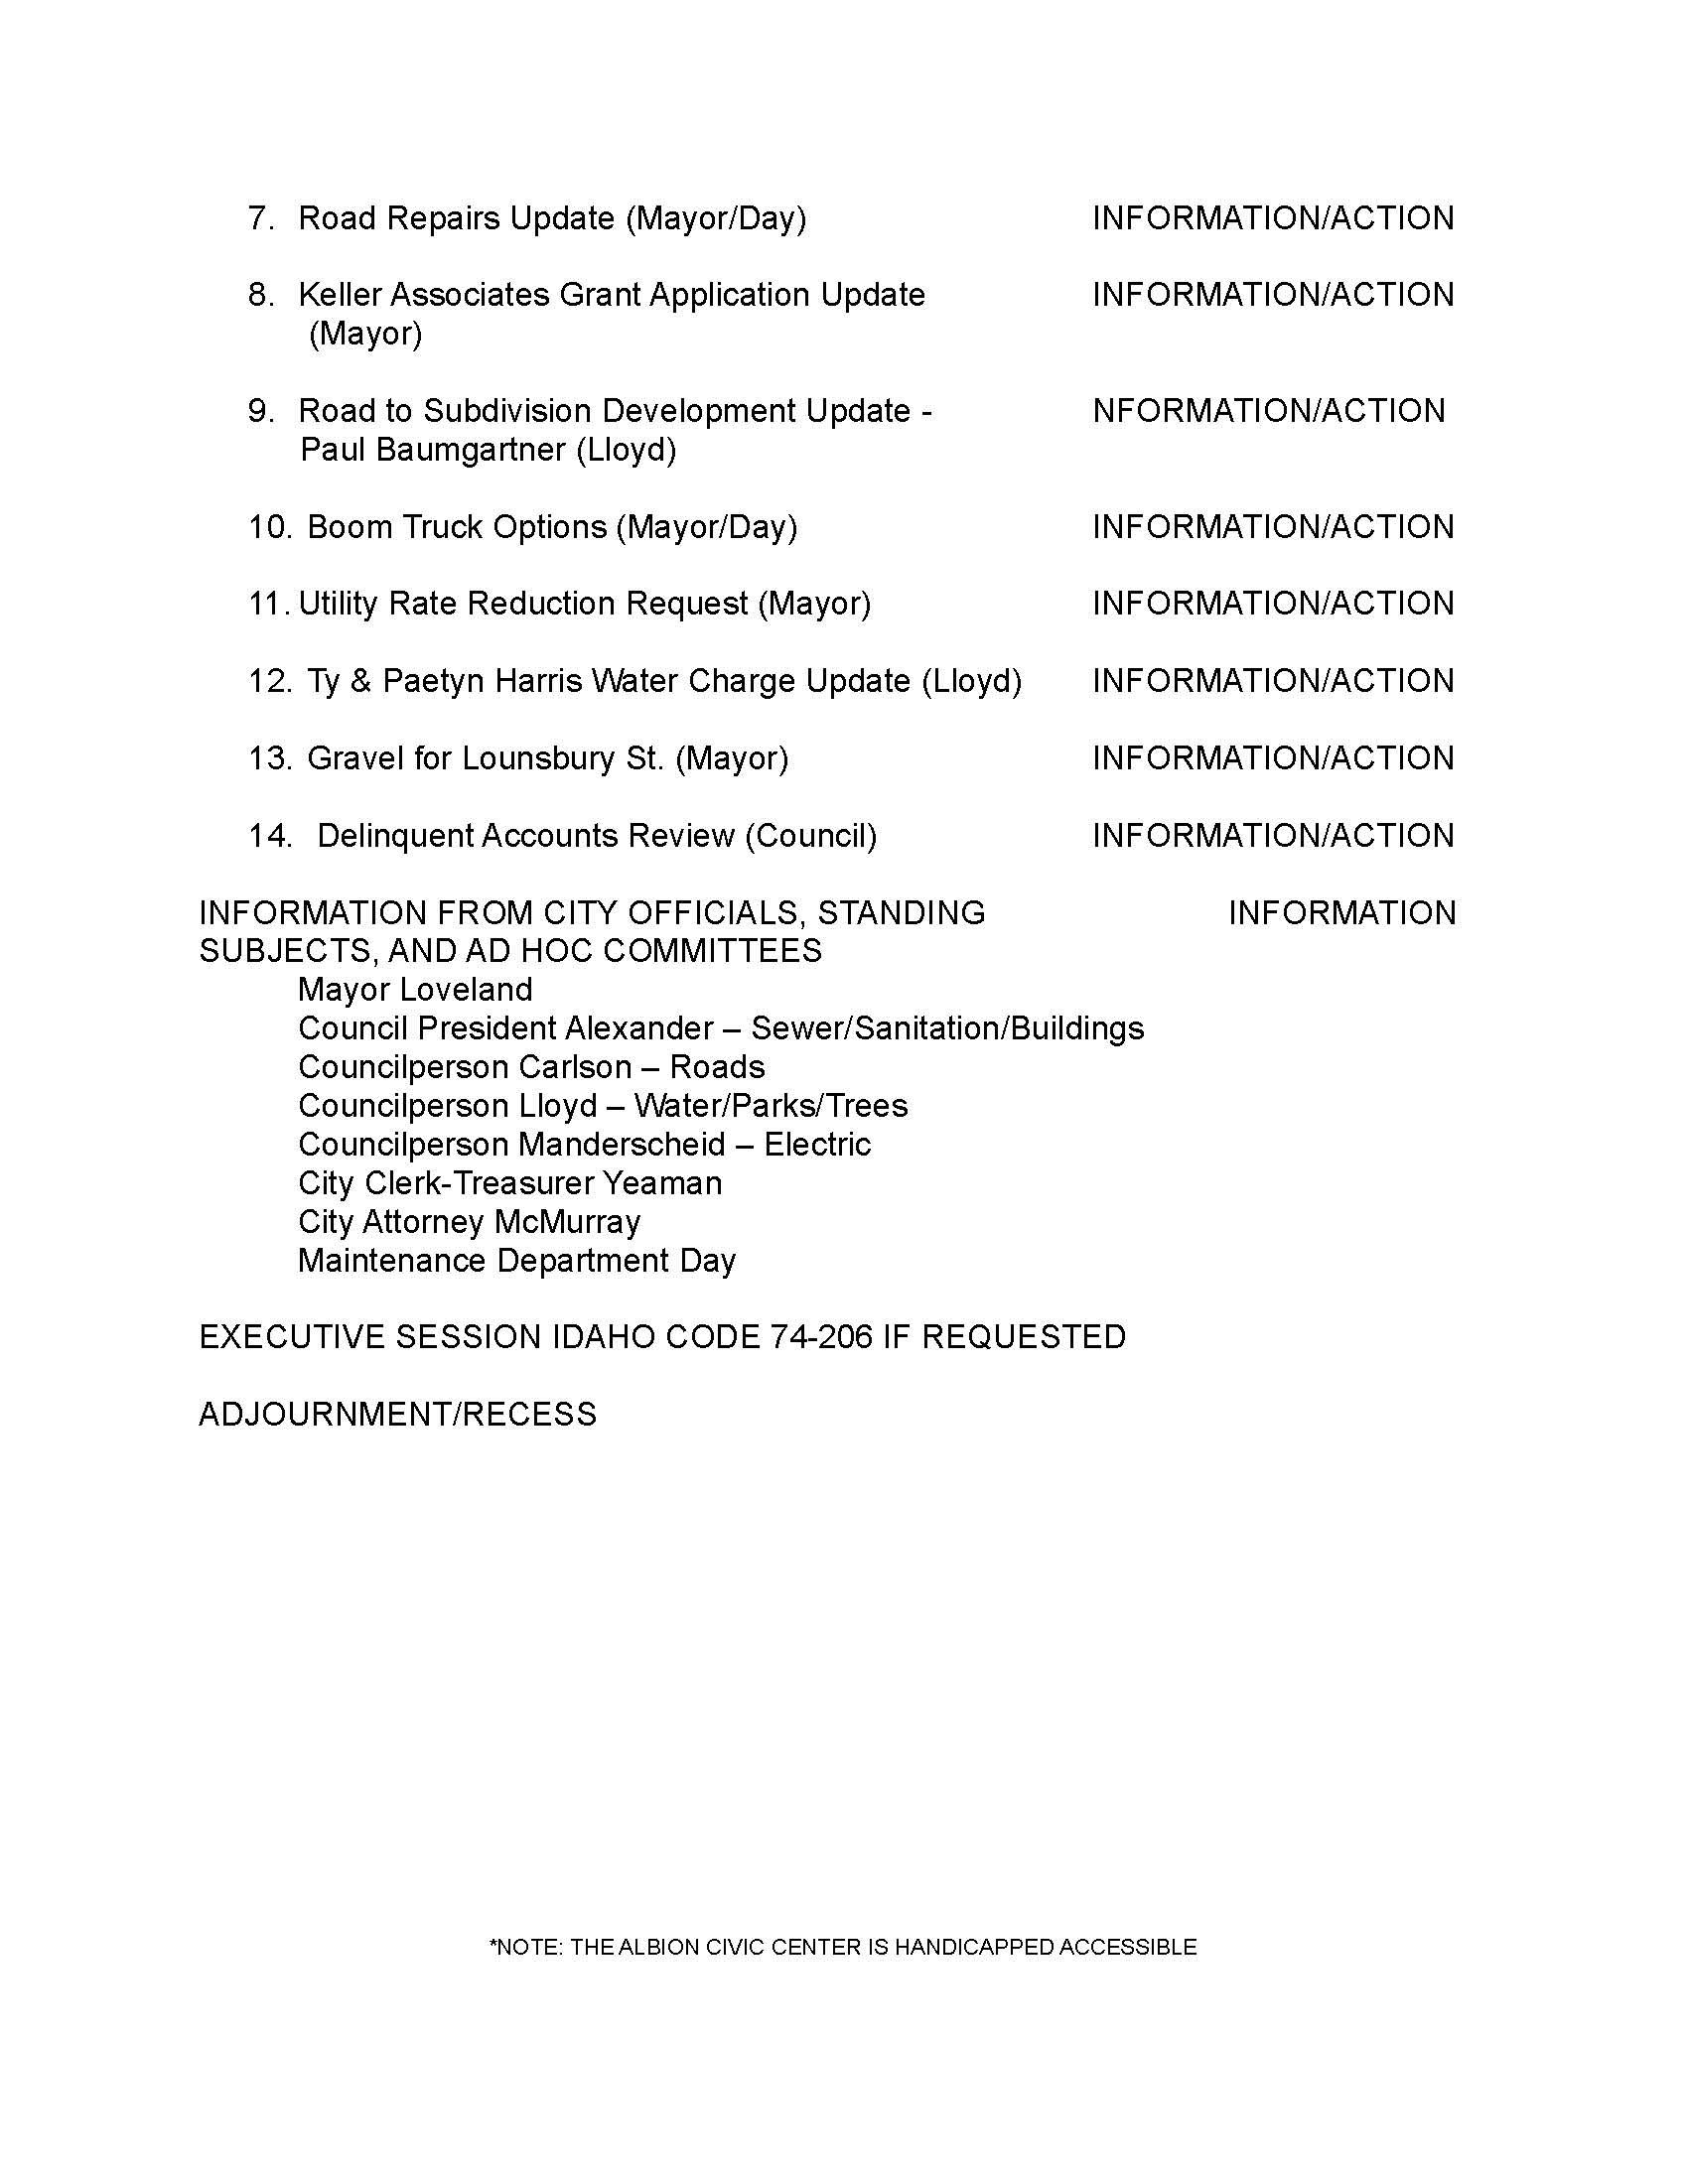 Agenda 02.05.19_Page_2.jpg